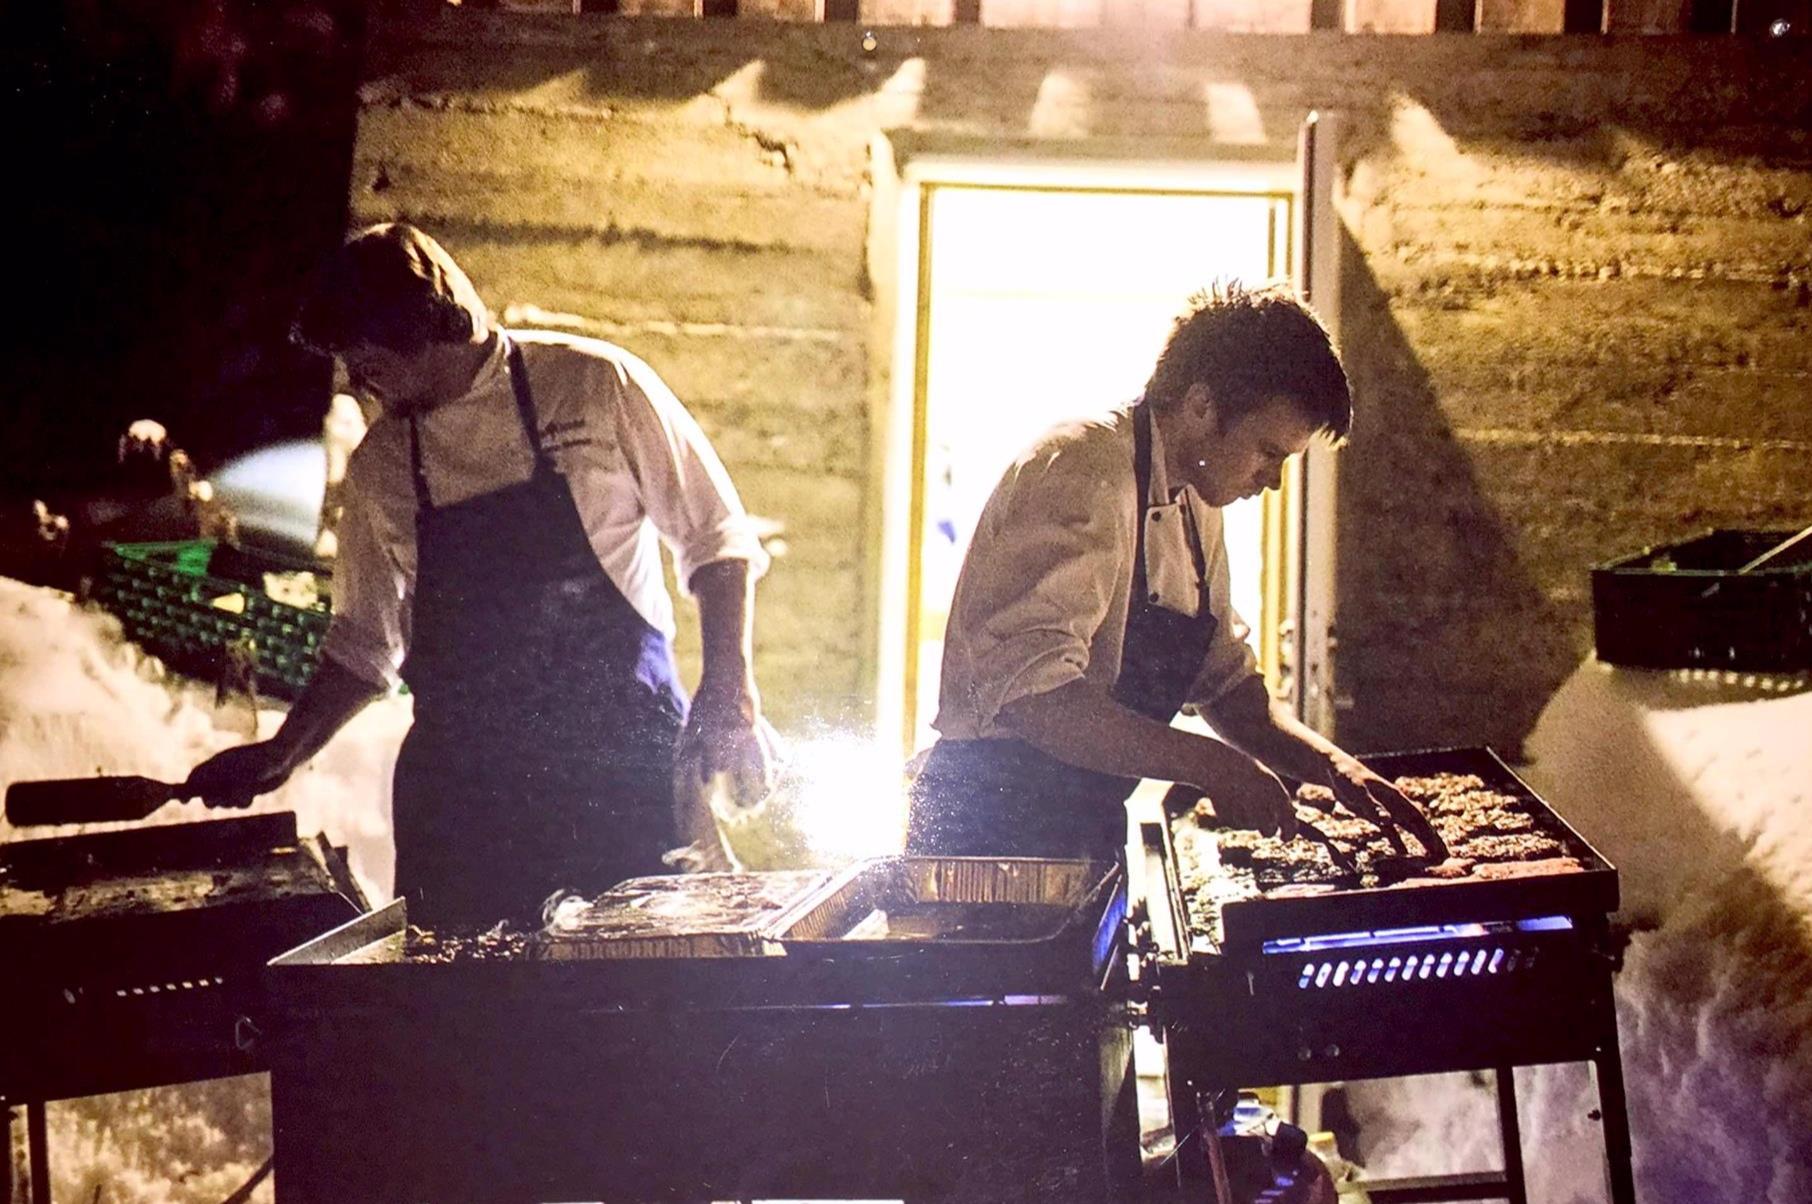 Paa Bordet - Langtidsstekt CharolaisServert i tynnbrød med salat, saltbakte beter, syltet løk og estragonsaus.Charolais BiffburgerServeres i brød med cheddarsaus, eplesalat, chilimajo og fritert løk.VegetarTynnbrød med salat, saltbakte beter, syltet løk og estragonsaus.Ramsløkpølse fra AnnisMed potetsalat i brød.